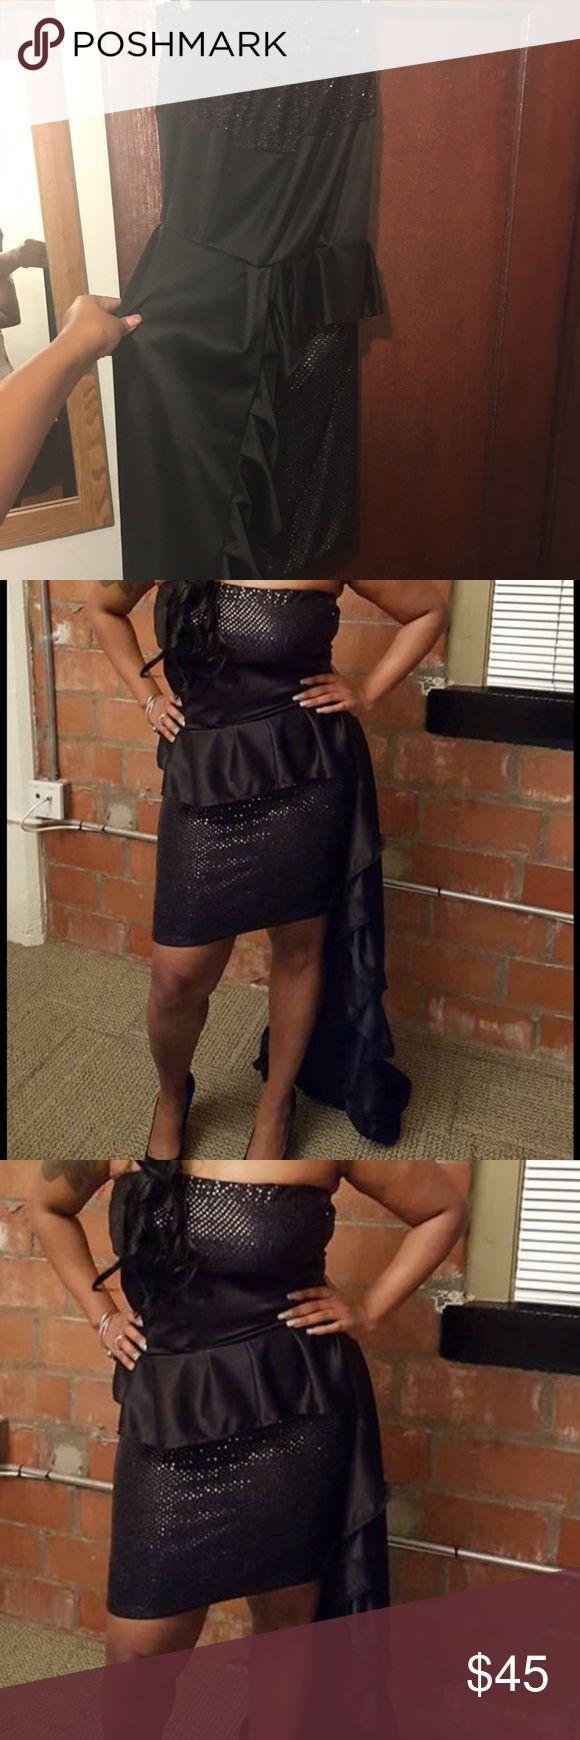 Prom dress Peplum prom dress. Train on left side touches the floor. Mini dress with train. Worn 1x. Dresses Prom